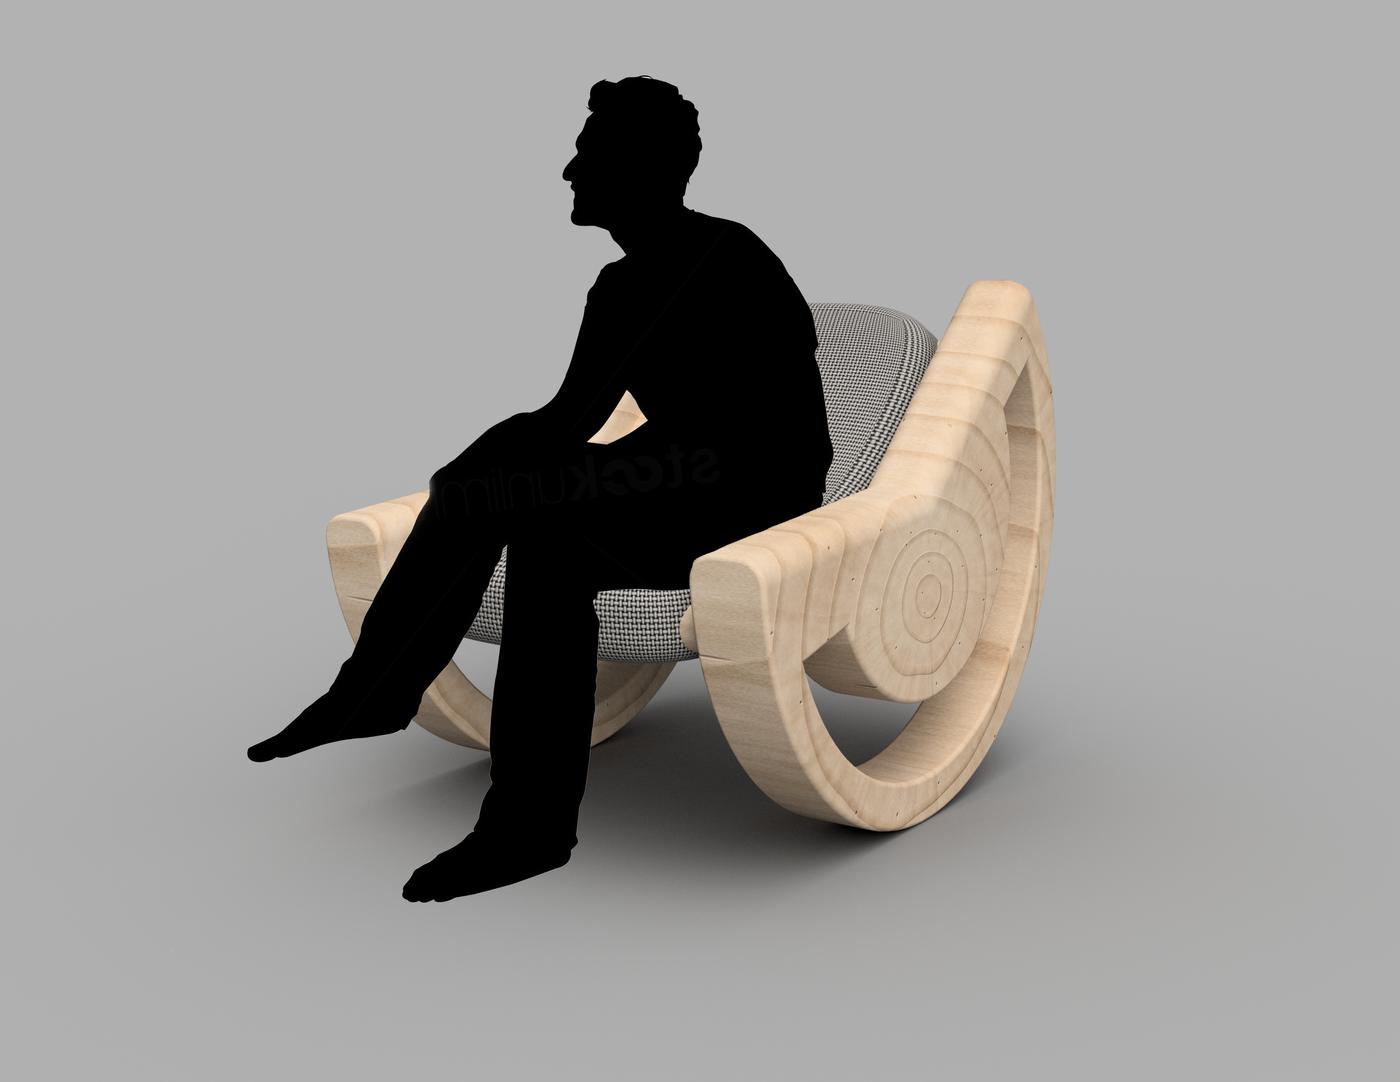 Astonishing Circular Wedge Rocker Chair By Jordan Linton At Coroflot Com Customarchery Wood Chair Design Ideas Customarcherynet